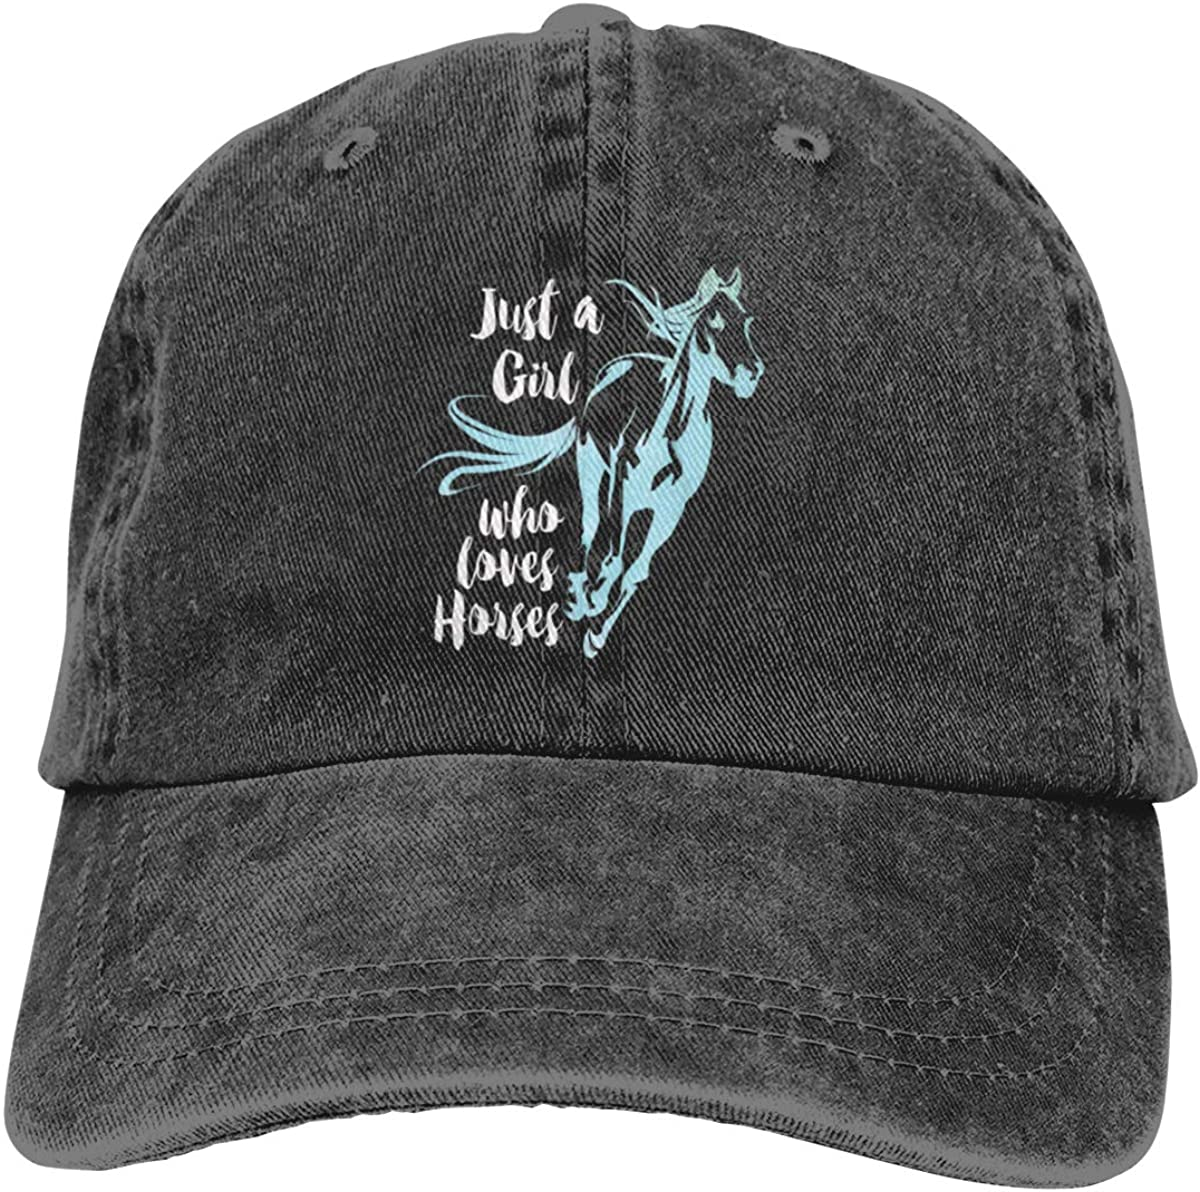 Love Horse Girl Men Women Washed Baseball Cap: Clothing